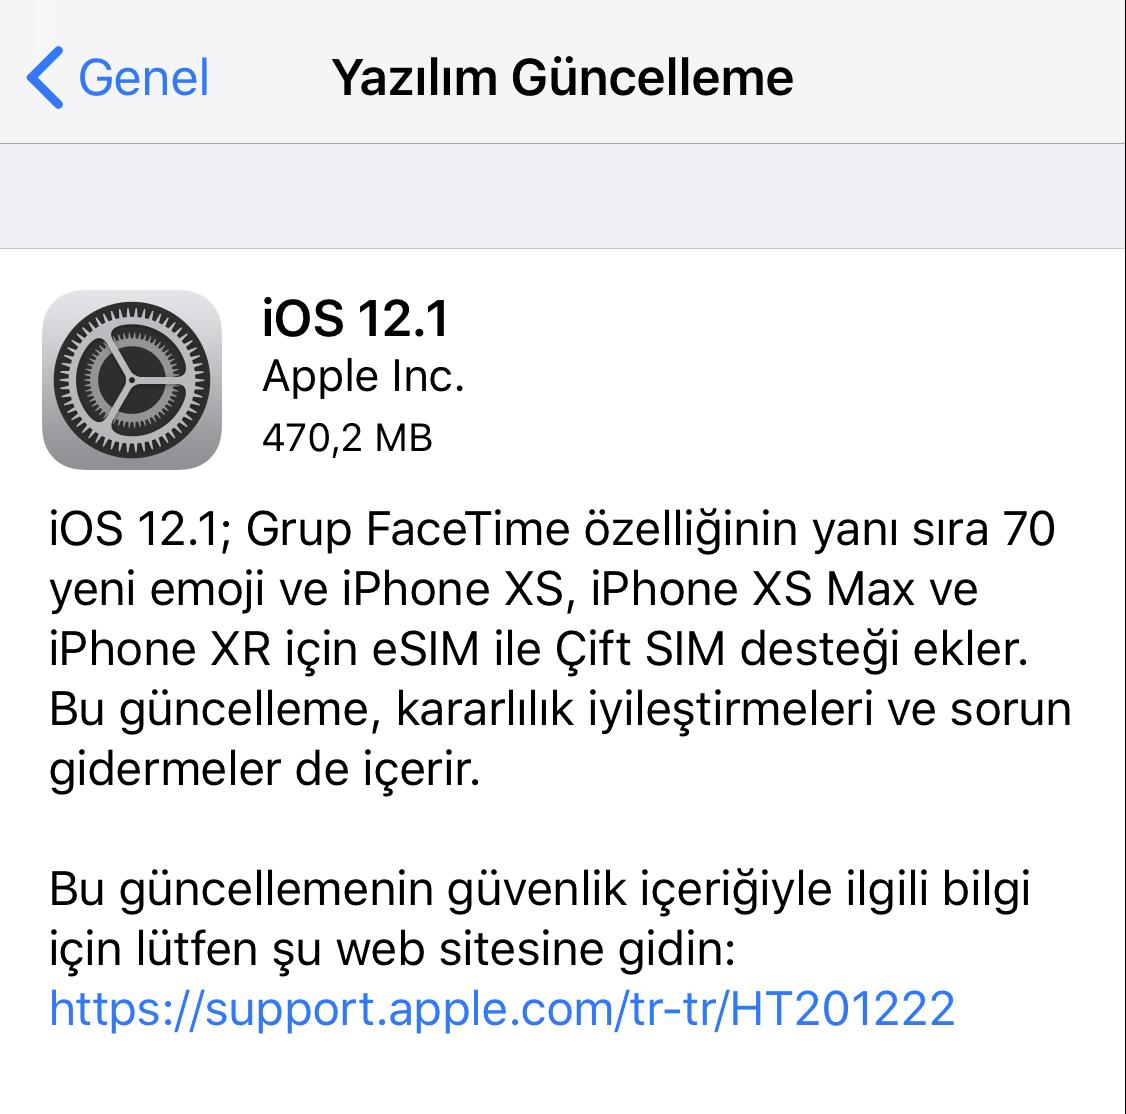 ios 12.1 güncellemesi